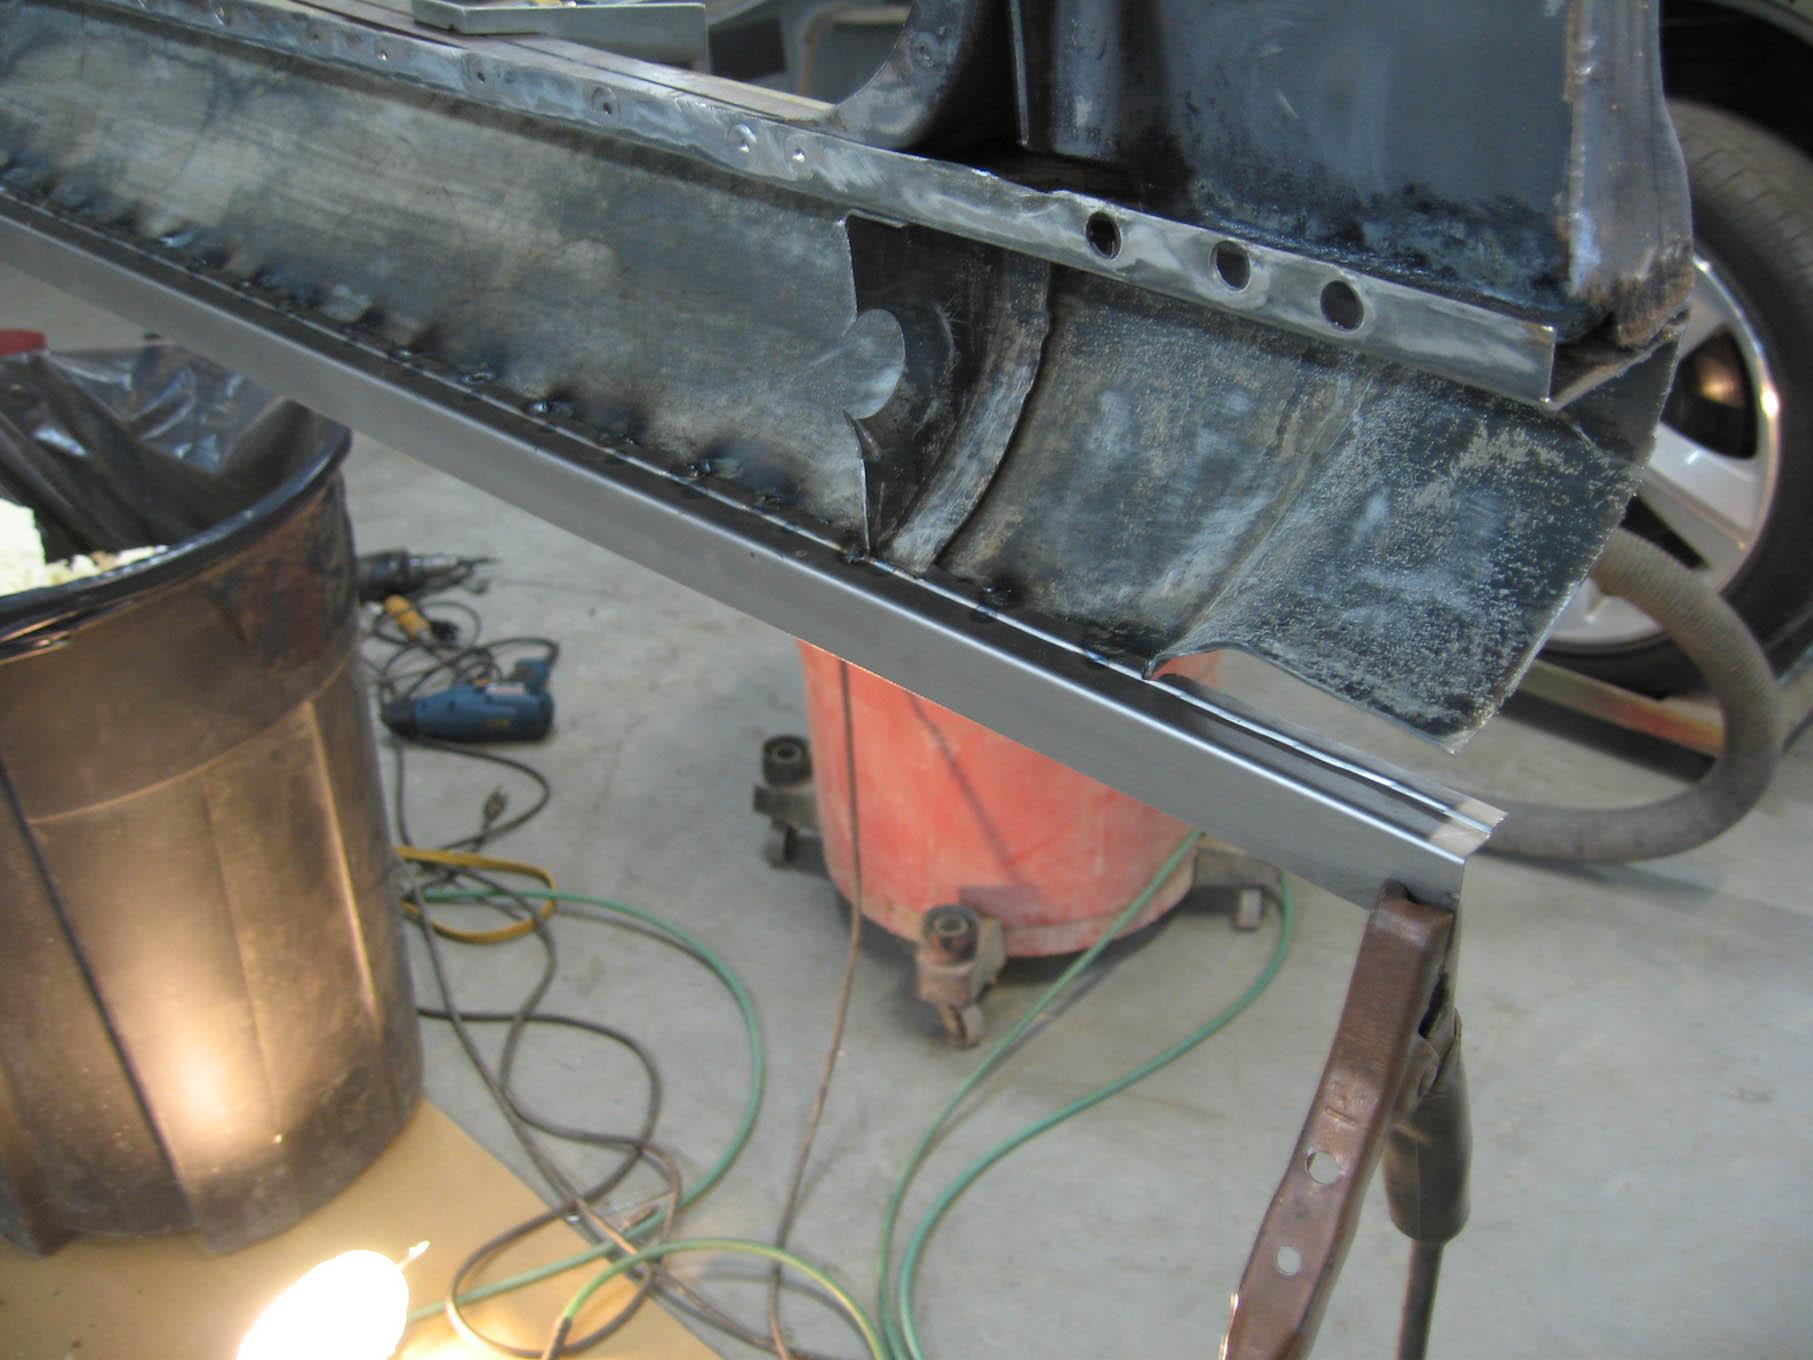 Turning A Wrecked Charger Srt8 Into 69 Dodge Daytona Clone Photo 1968 Firewall Wiring Harness Diagram 054 Rocker Panel Merger 2013 09 08 003 Lpr